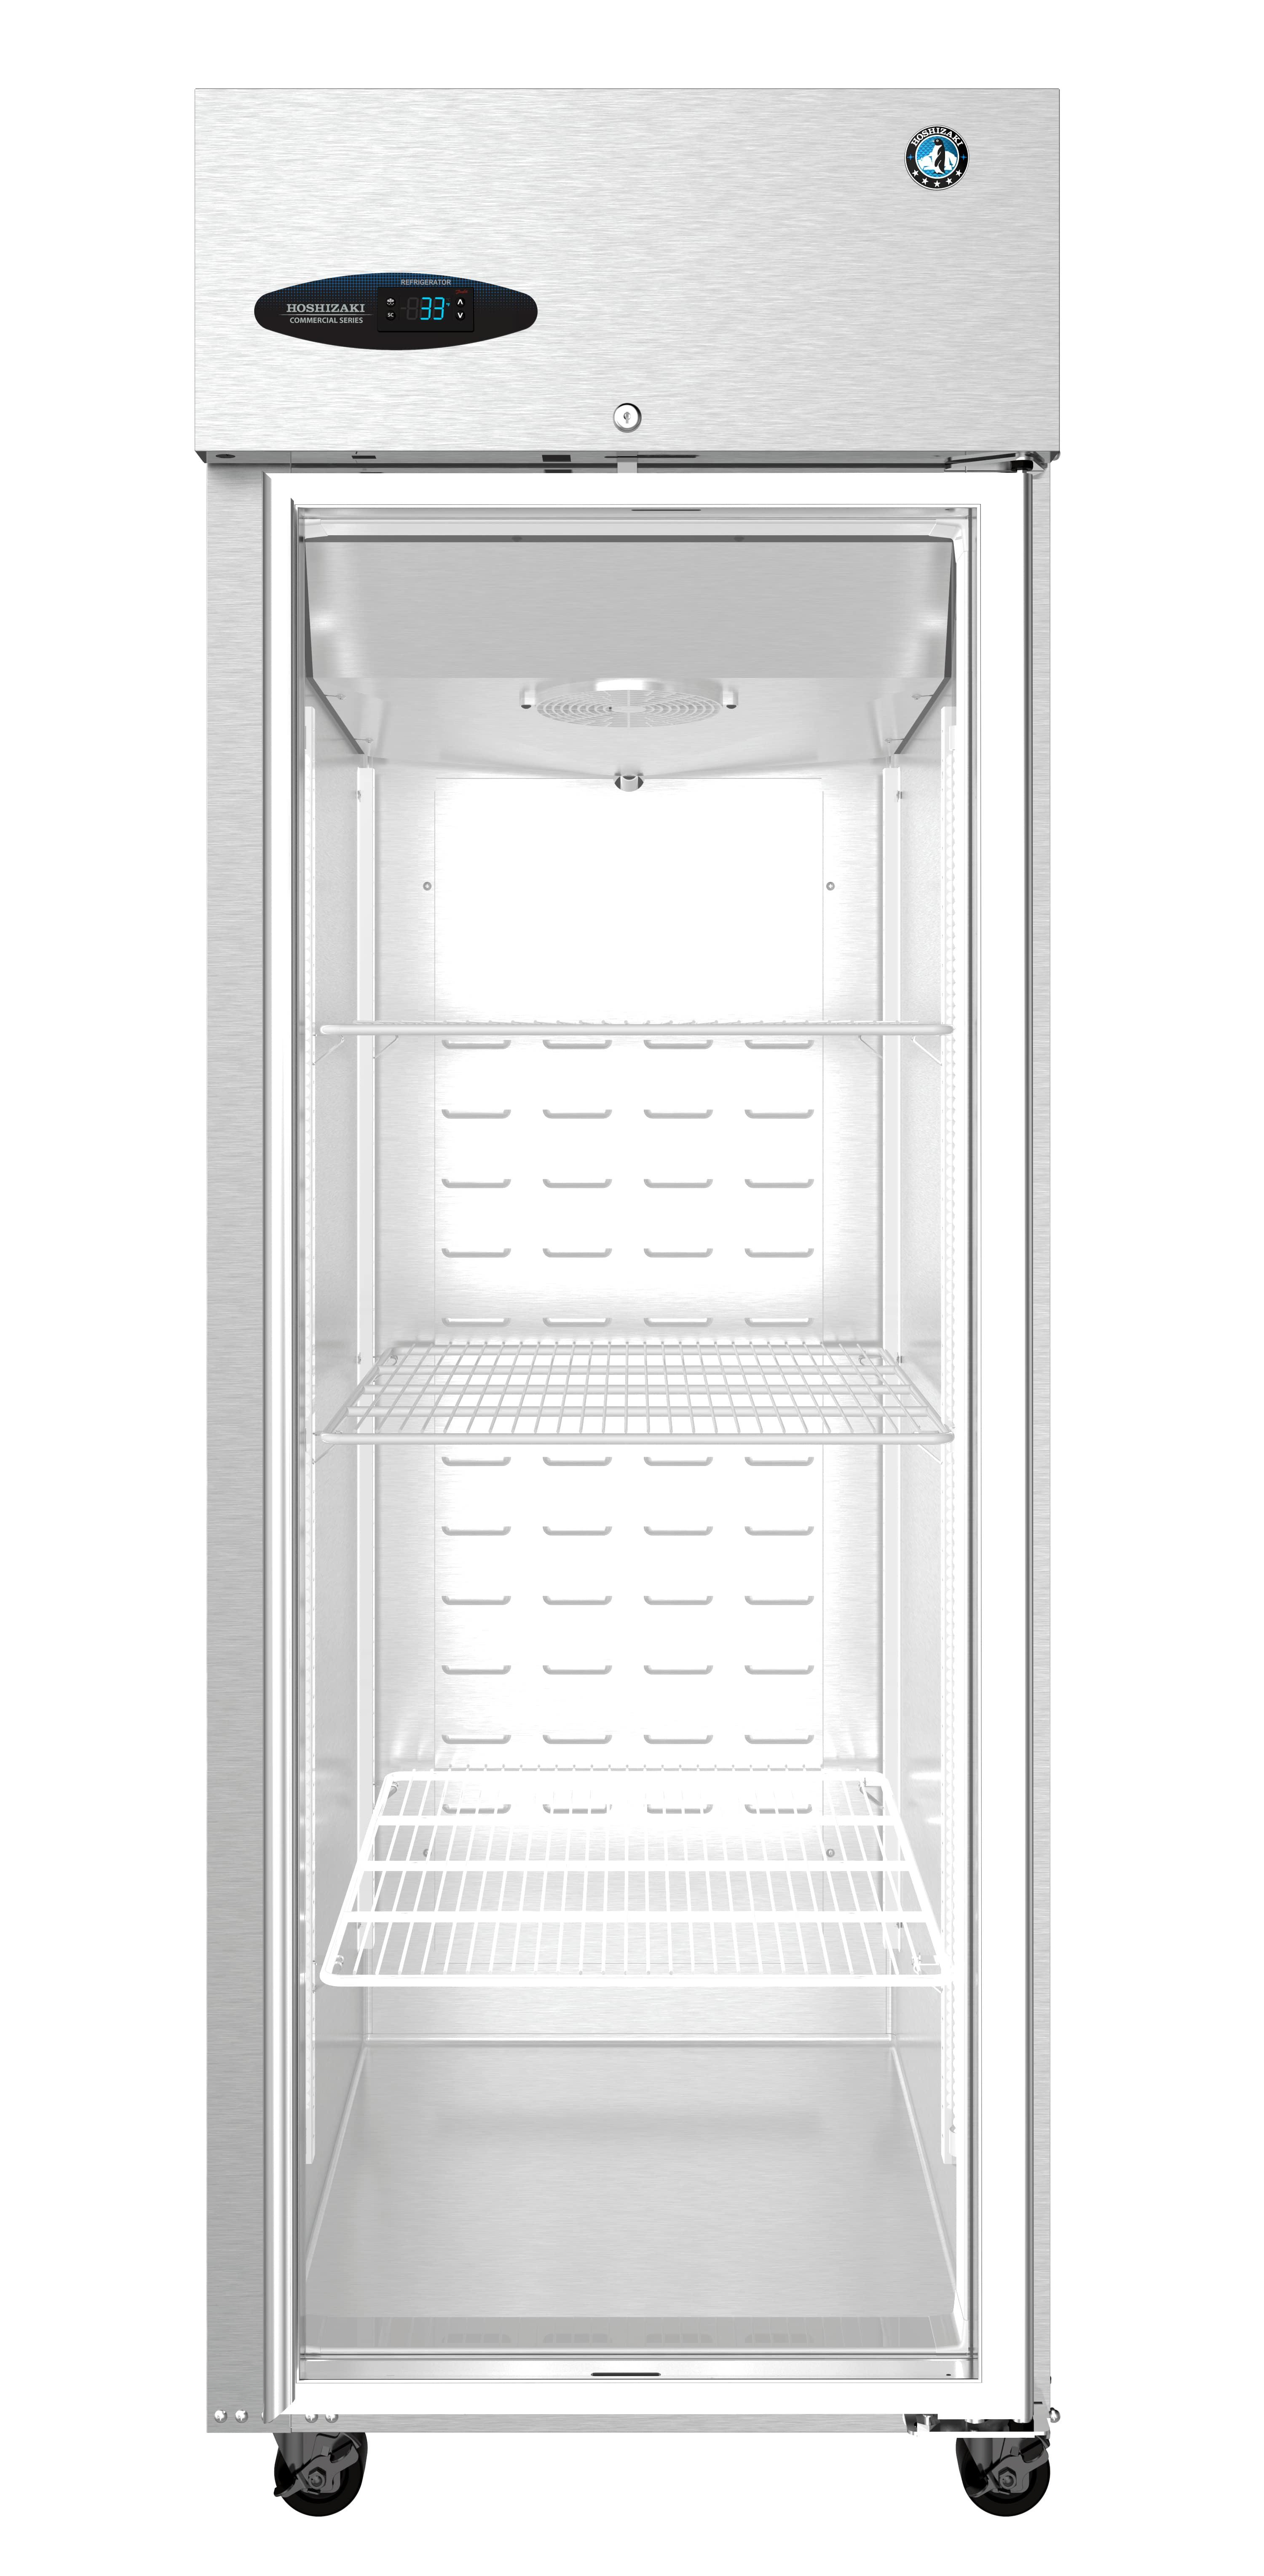 ETL Upright Single Stainless Steel Glass Refrigerator